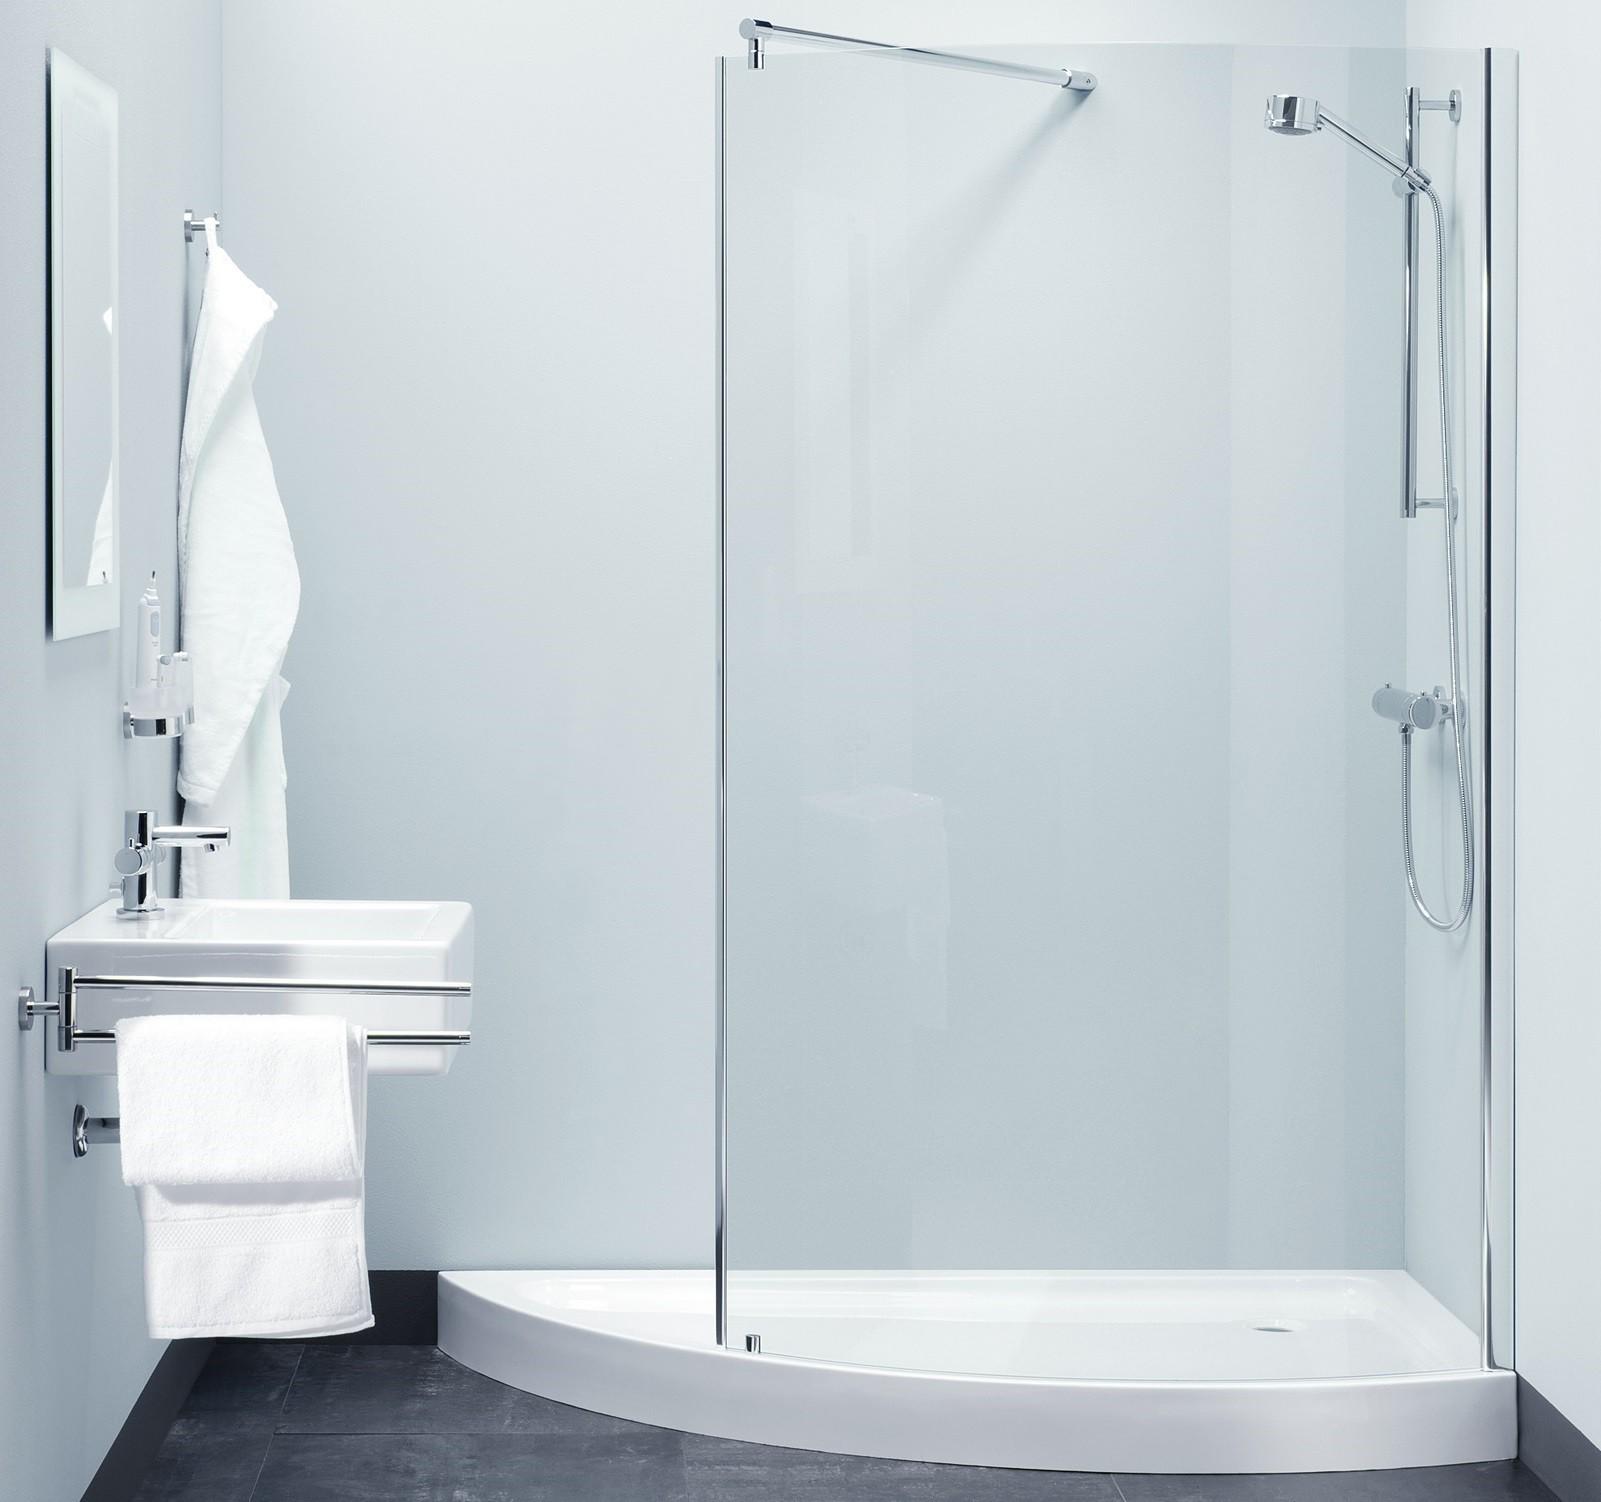 dusche walk in 120 x 190 cm duschwanne duschabtrennung dusche duschw nde duschtrennwand 120. Black Bedroom Furniture Sets. Home Design Ideas